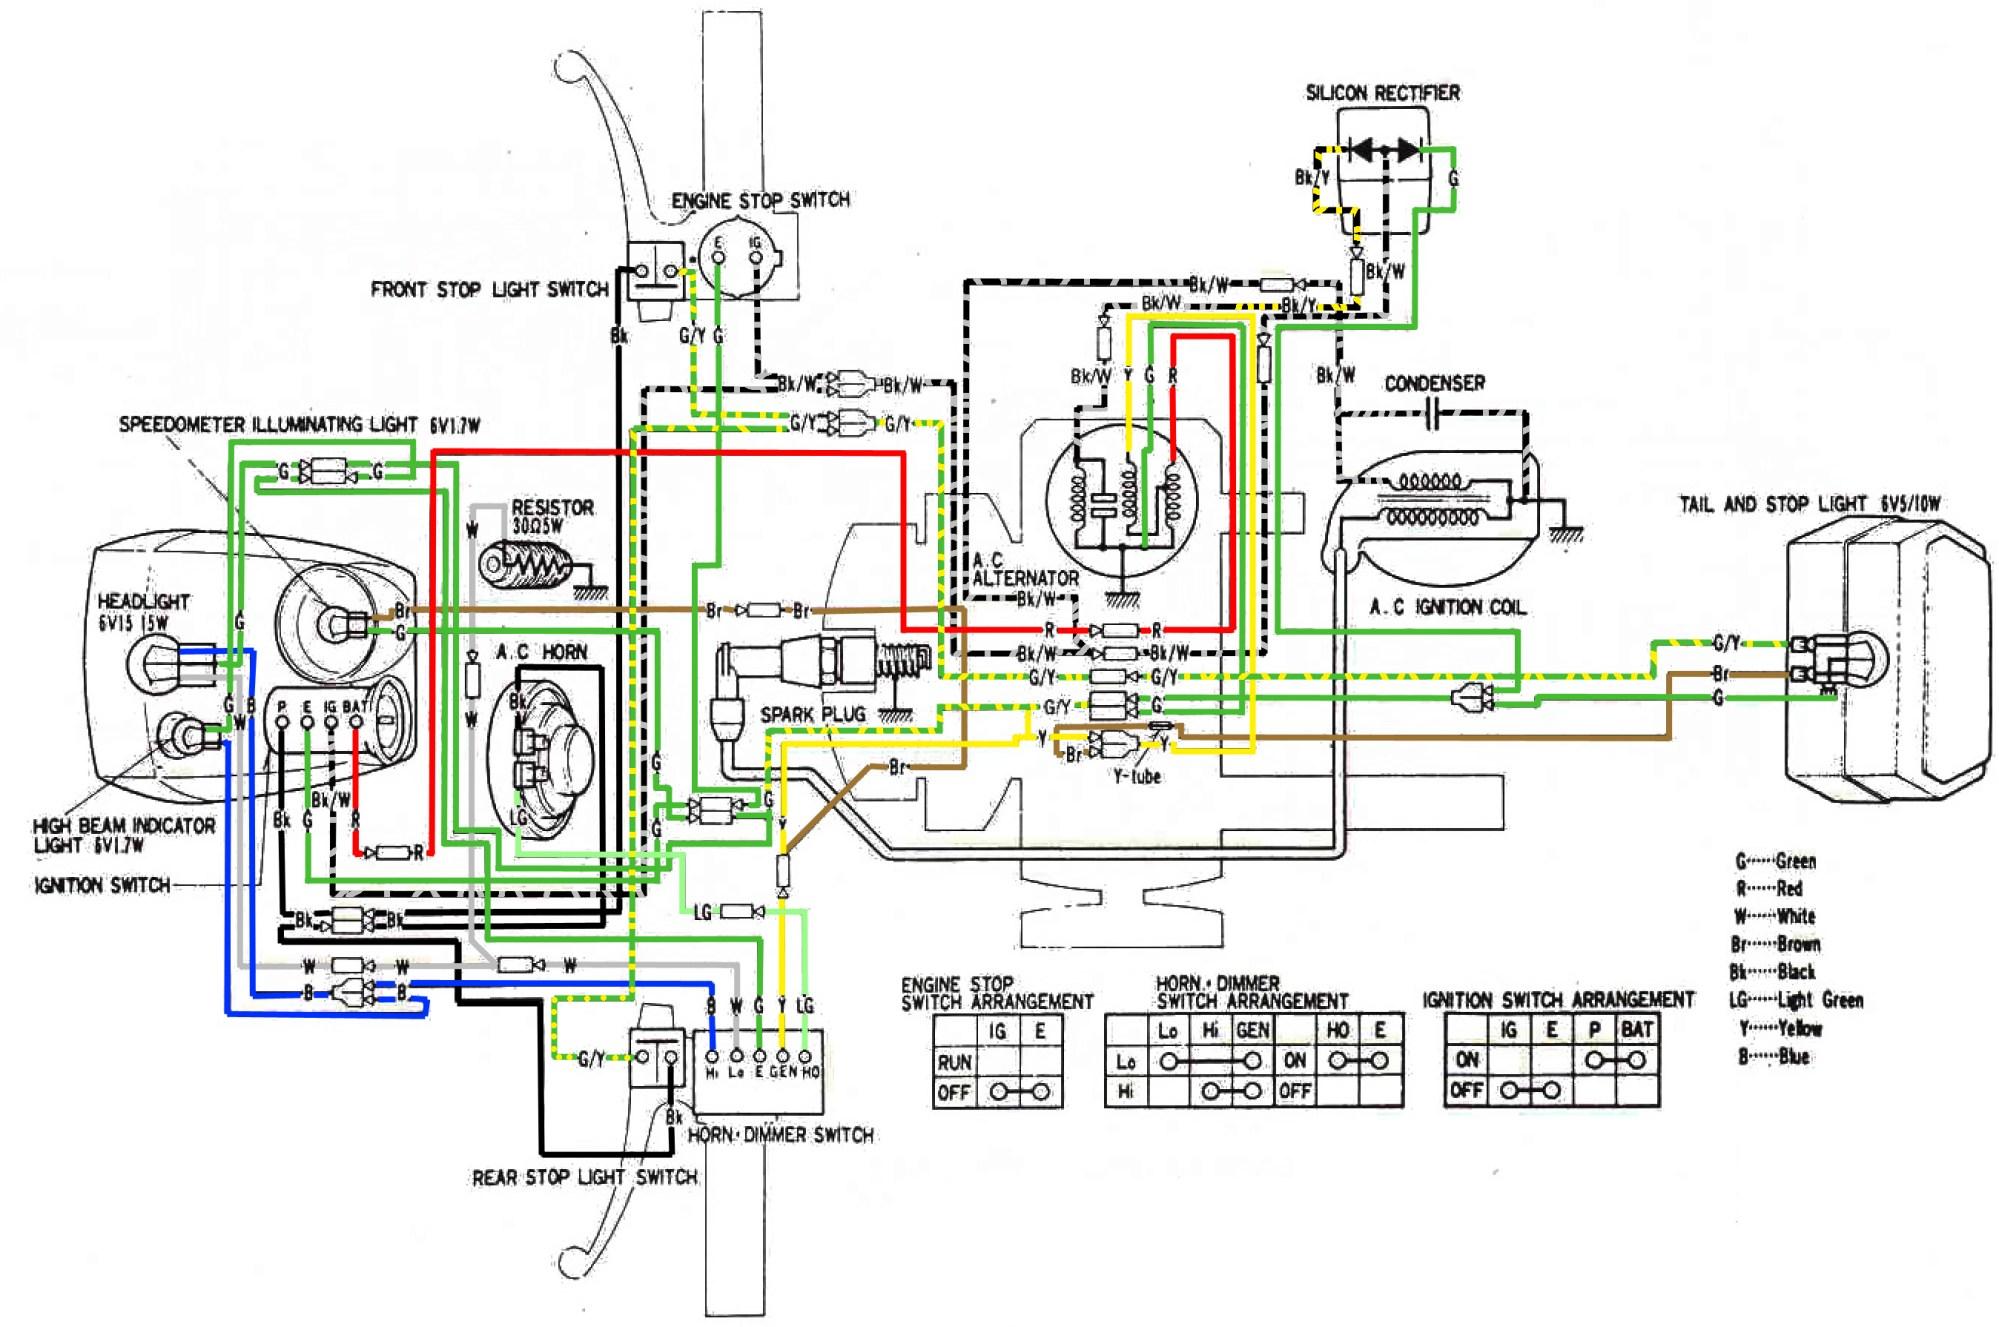 hight resolution of honda hobbit parts upcomingcarshq com 1978 honda hobbit wiring diagram honda hobbit wiring diagram